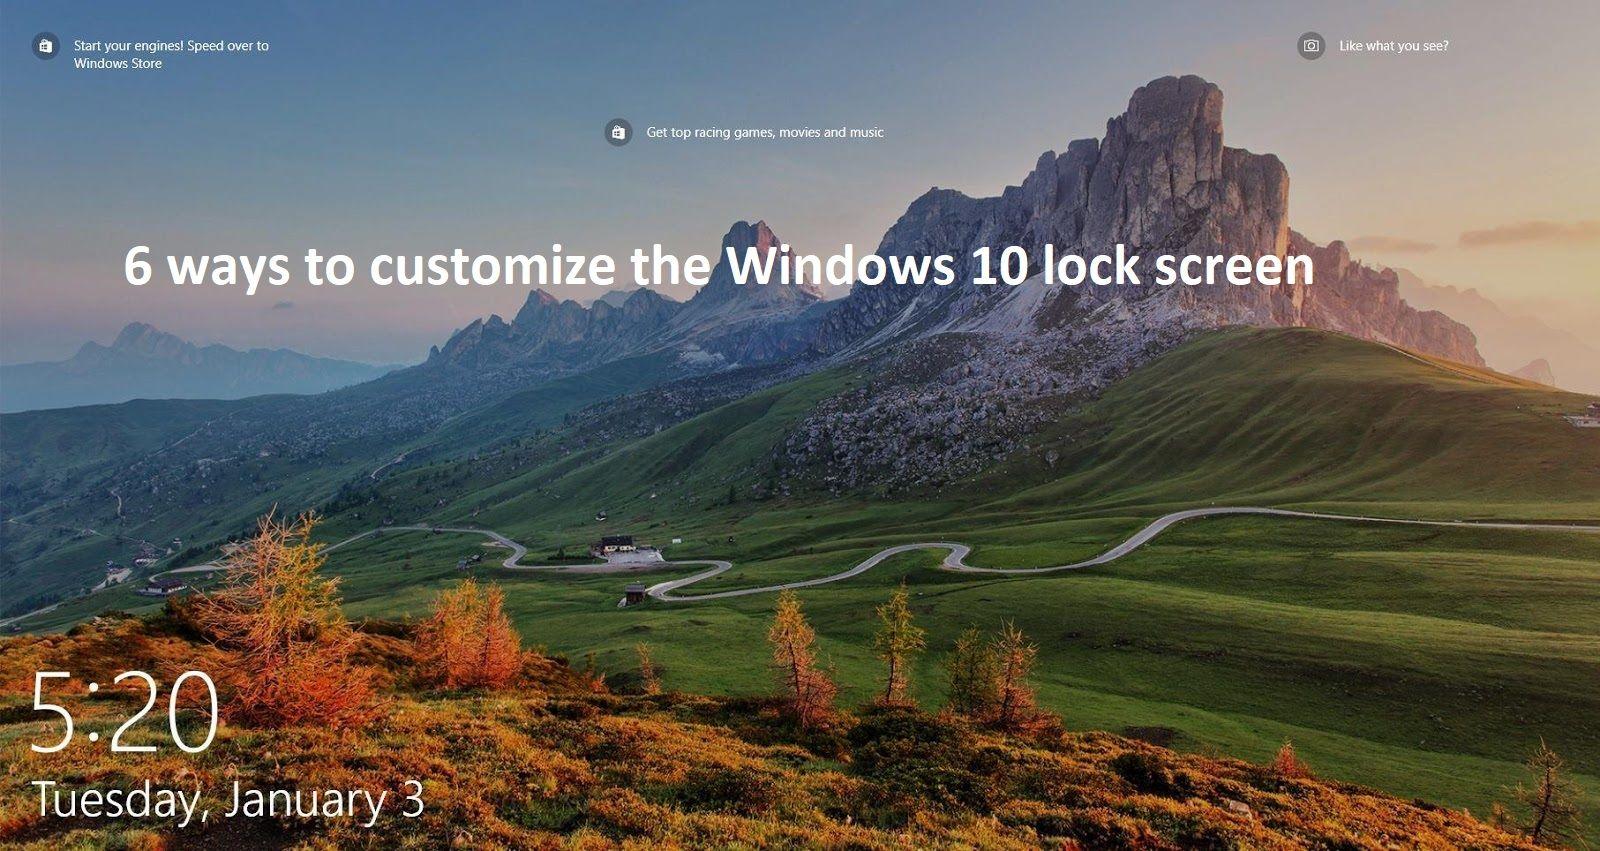 Pin By Techfordaily On Techfordaily Change Locks Lockscreen Windows 10